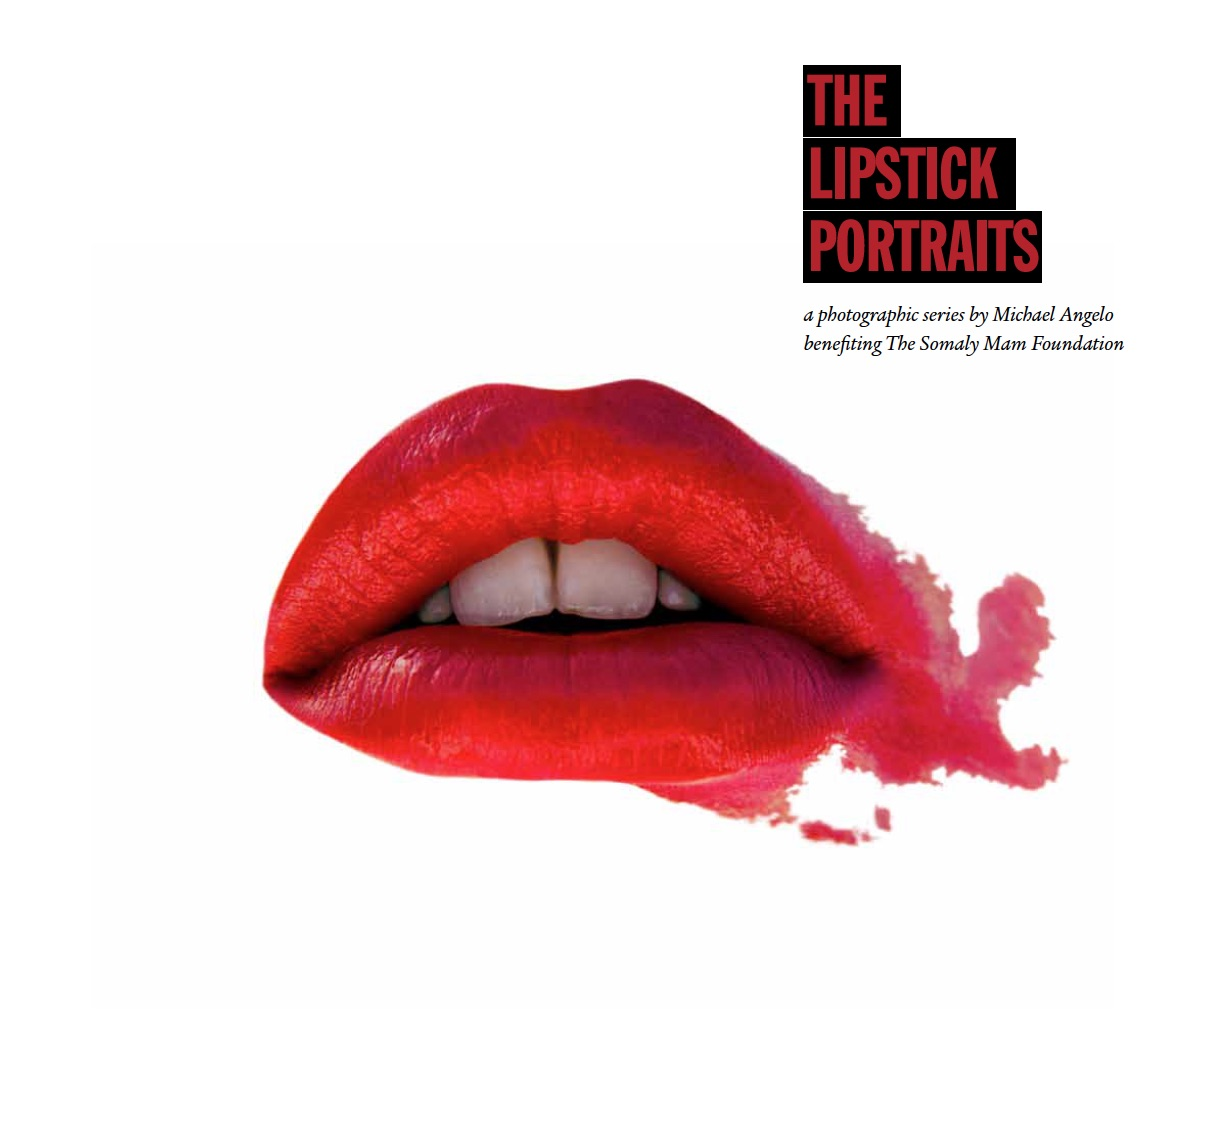 MA.LipstickLips.jpg